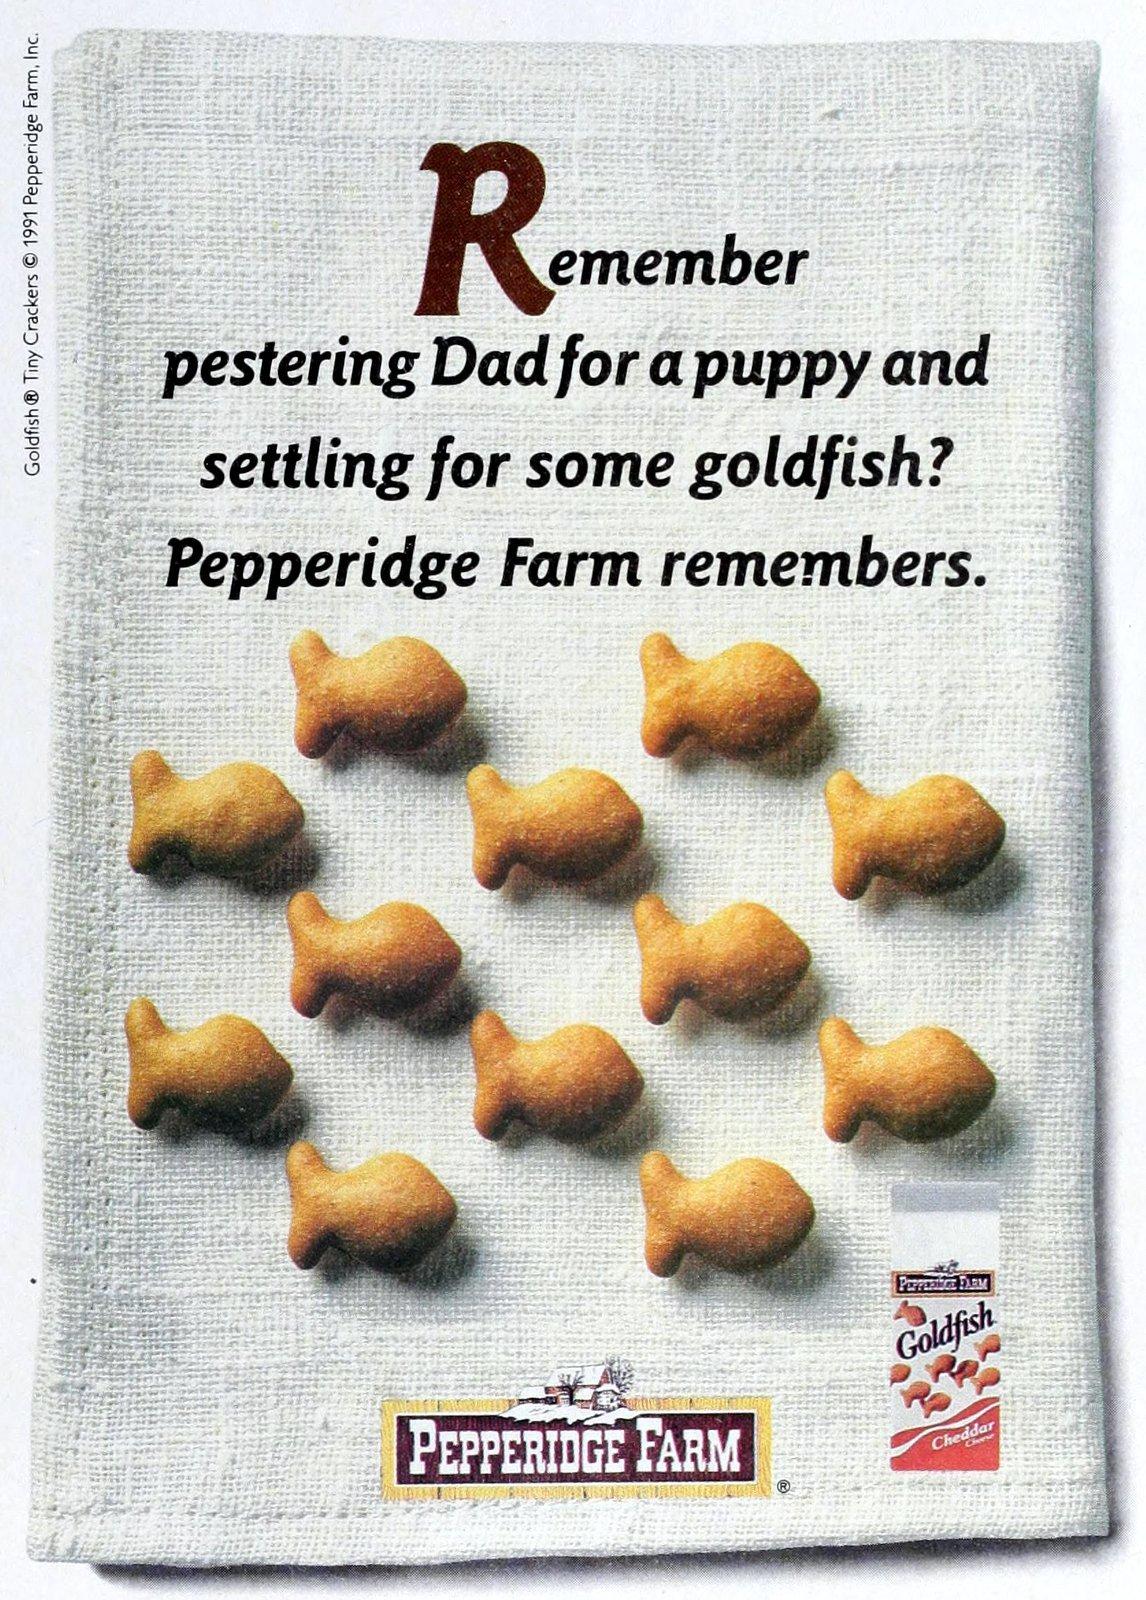 Goldfish crackers (1991)